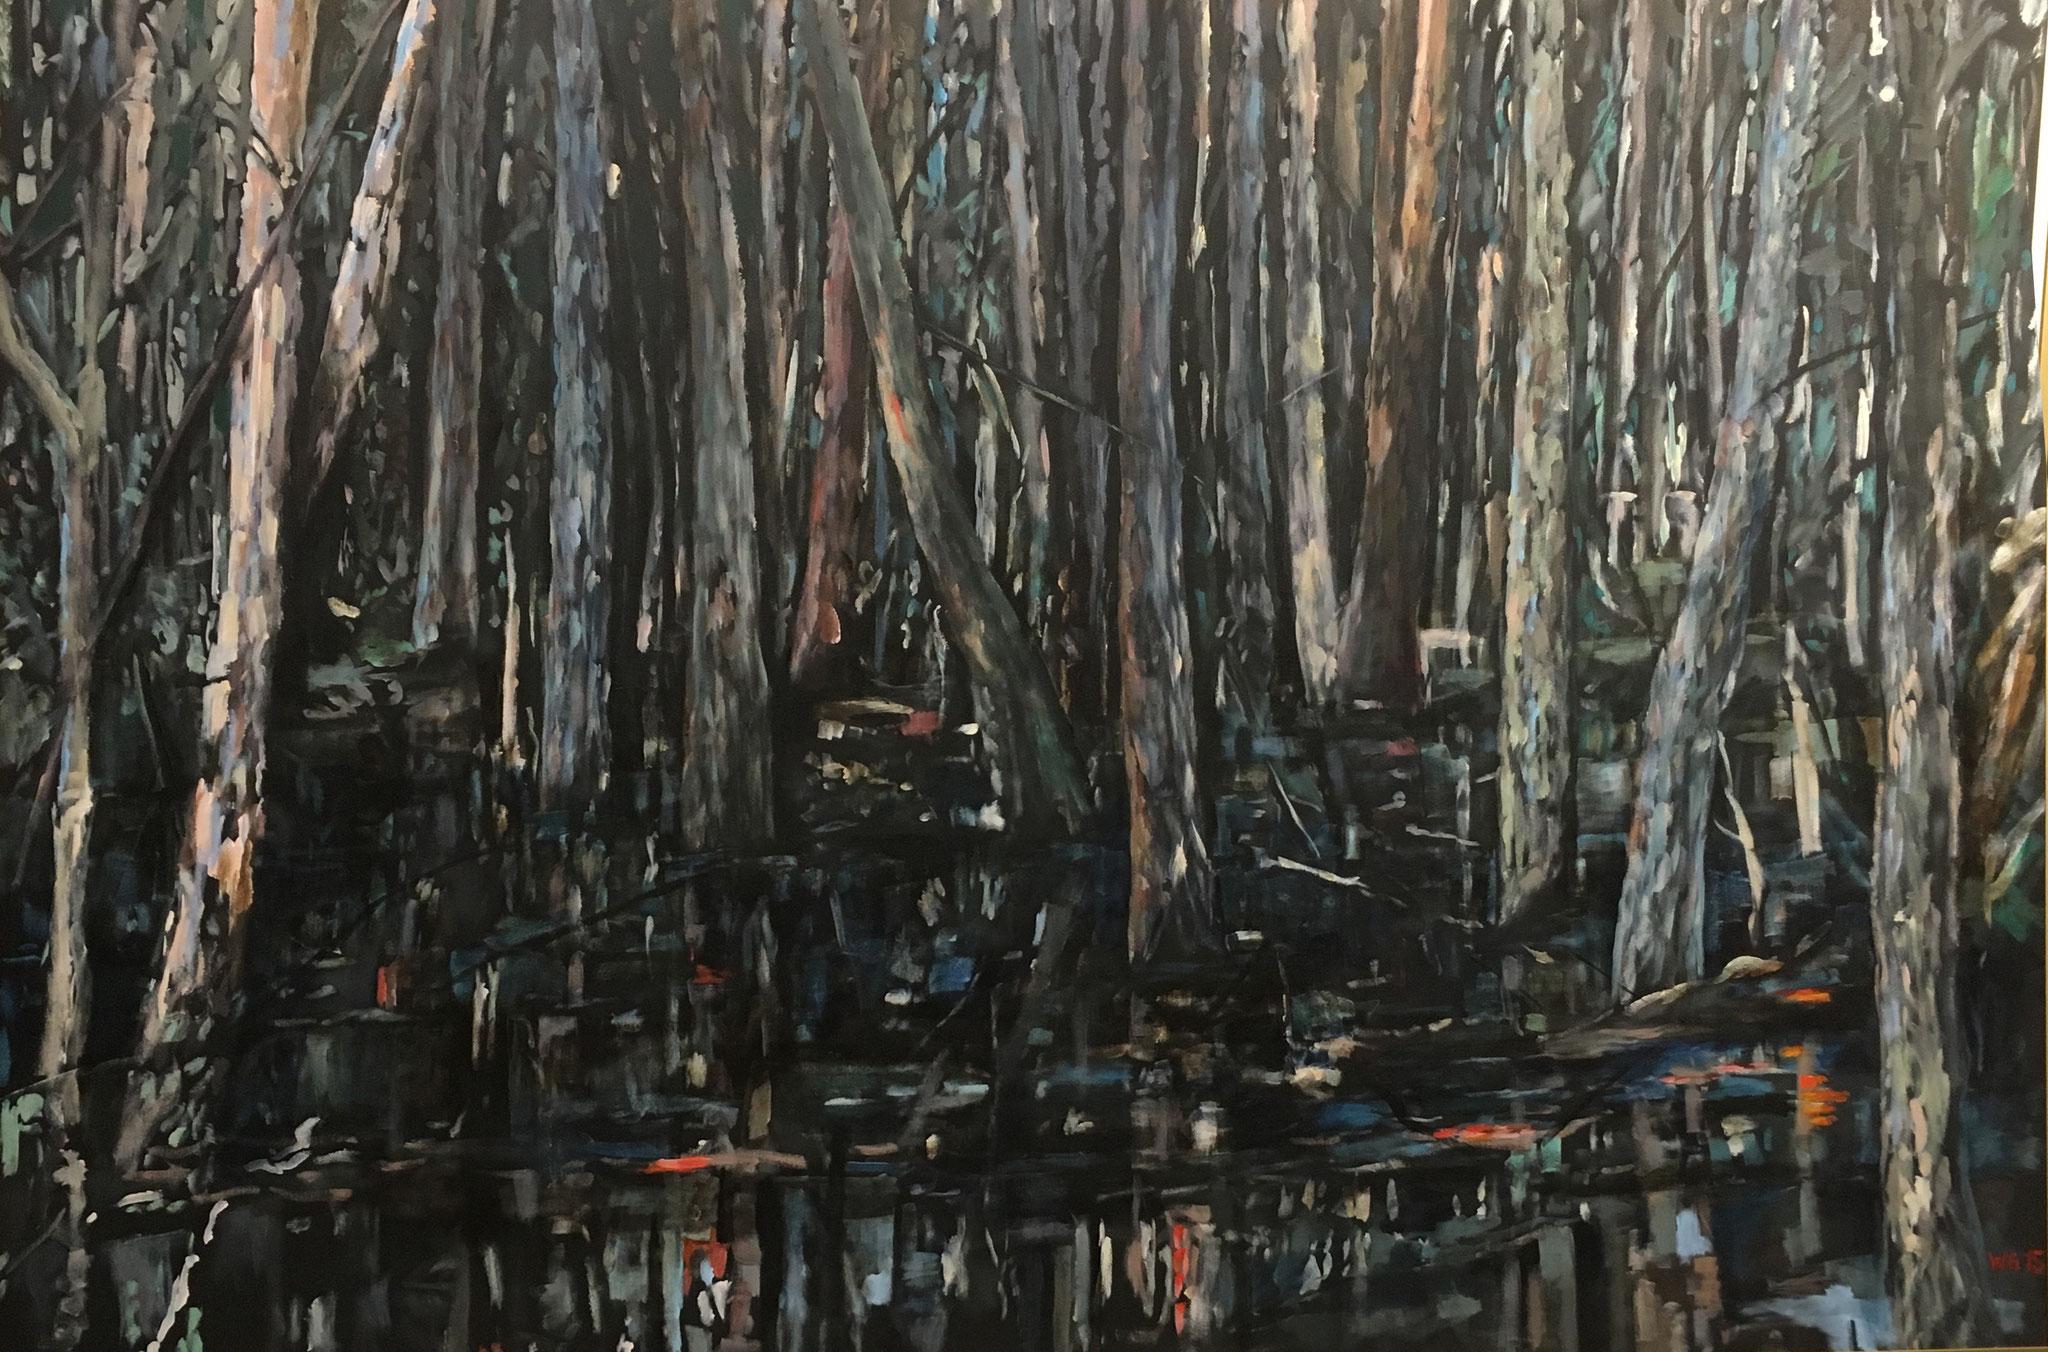 """Bäume im Sumpf"", Acryl auf Baumwolle, 100x140, 2015"